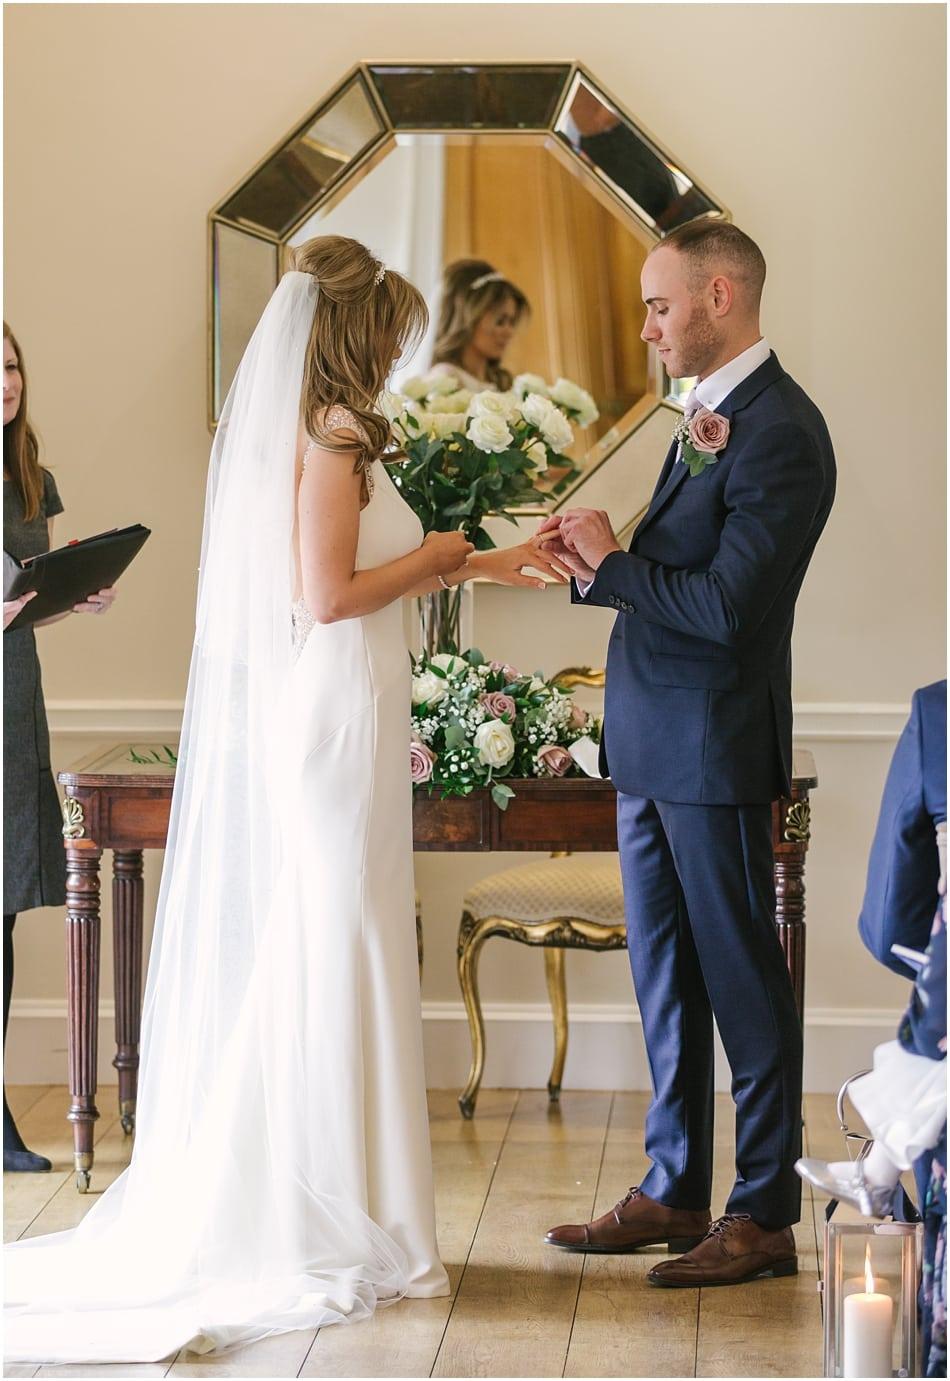 Exchanging wedding rings at an Alrewas Hayes wedding